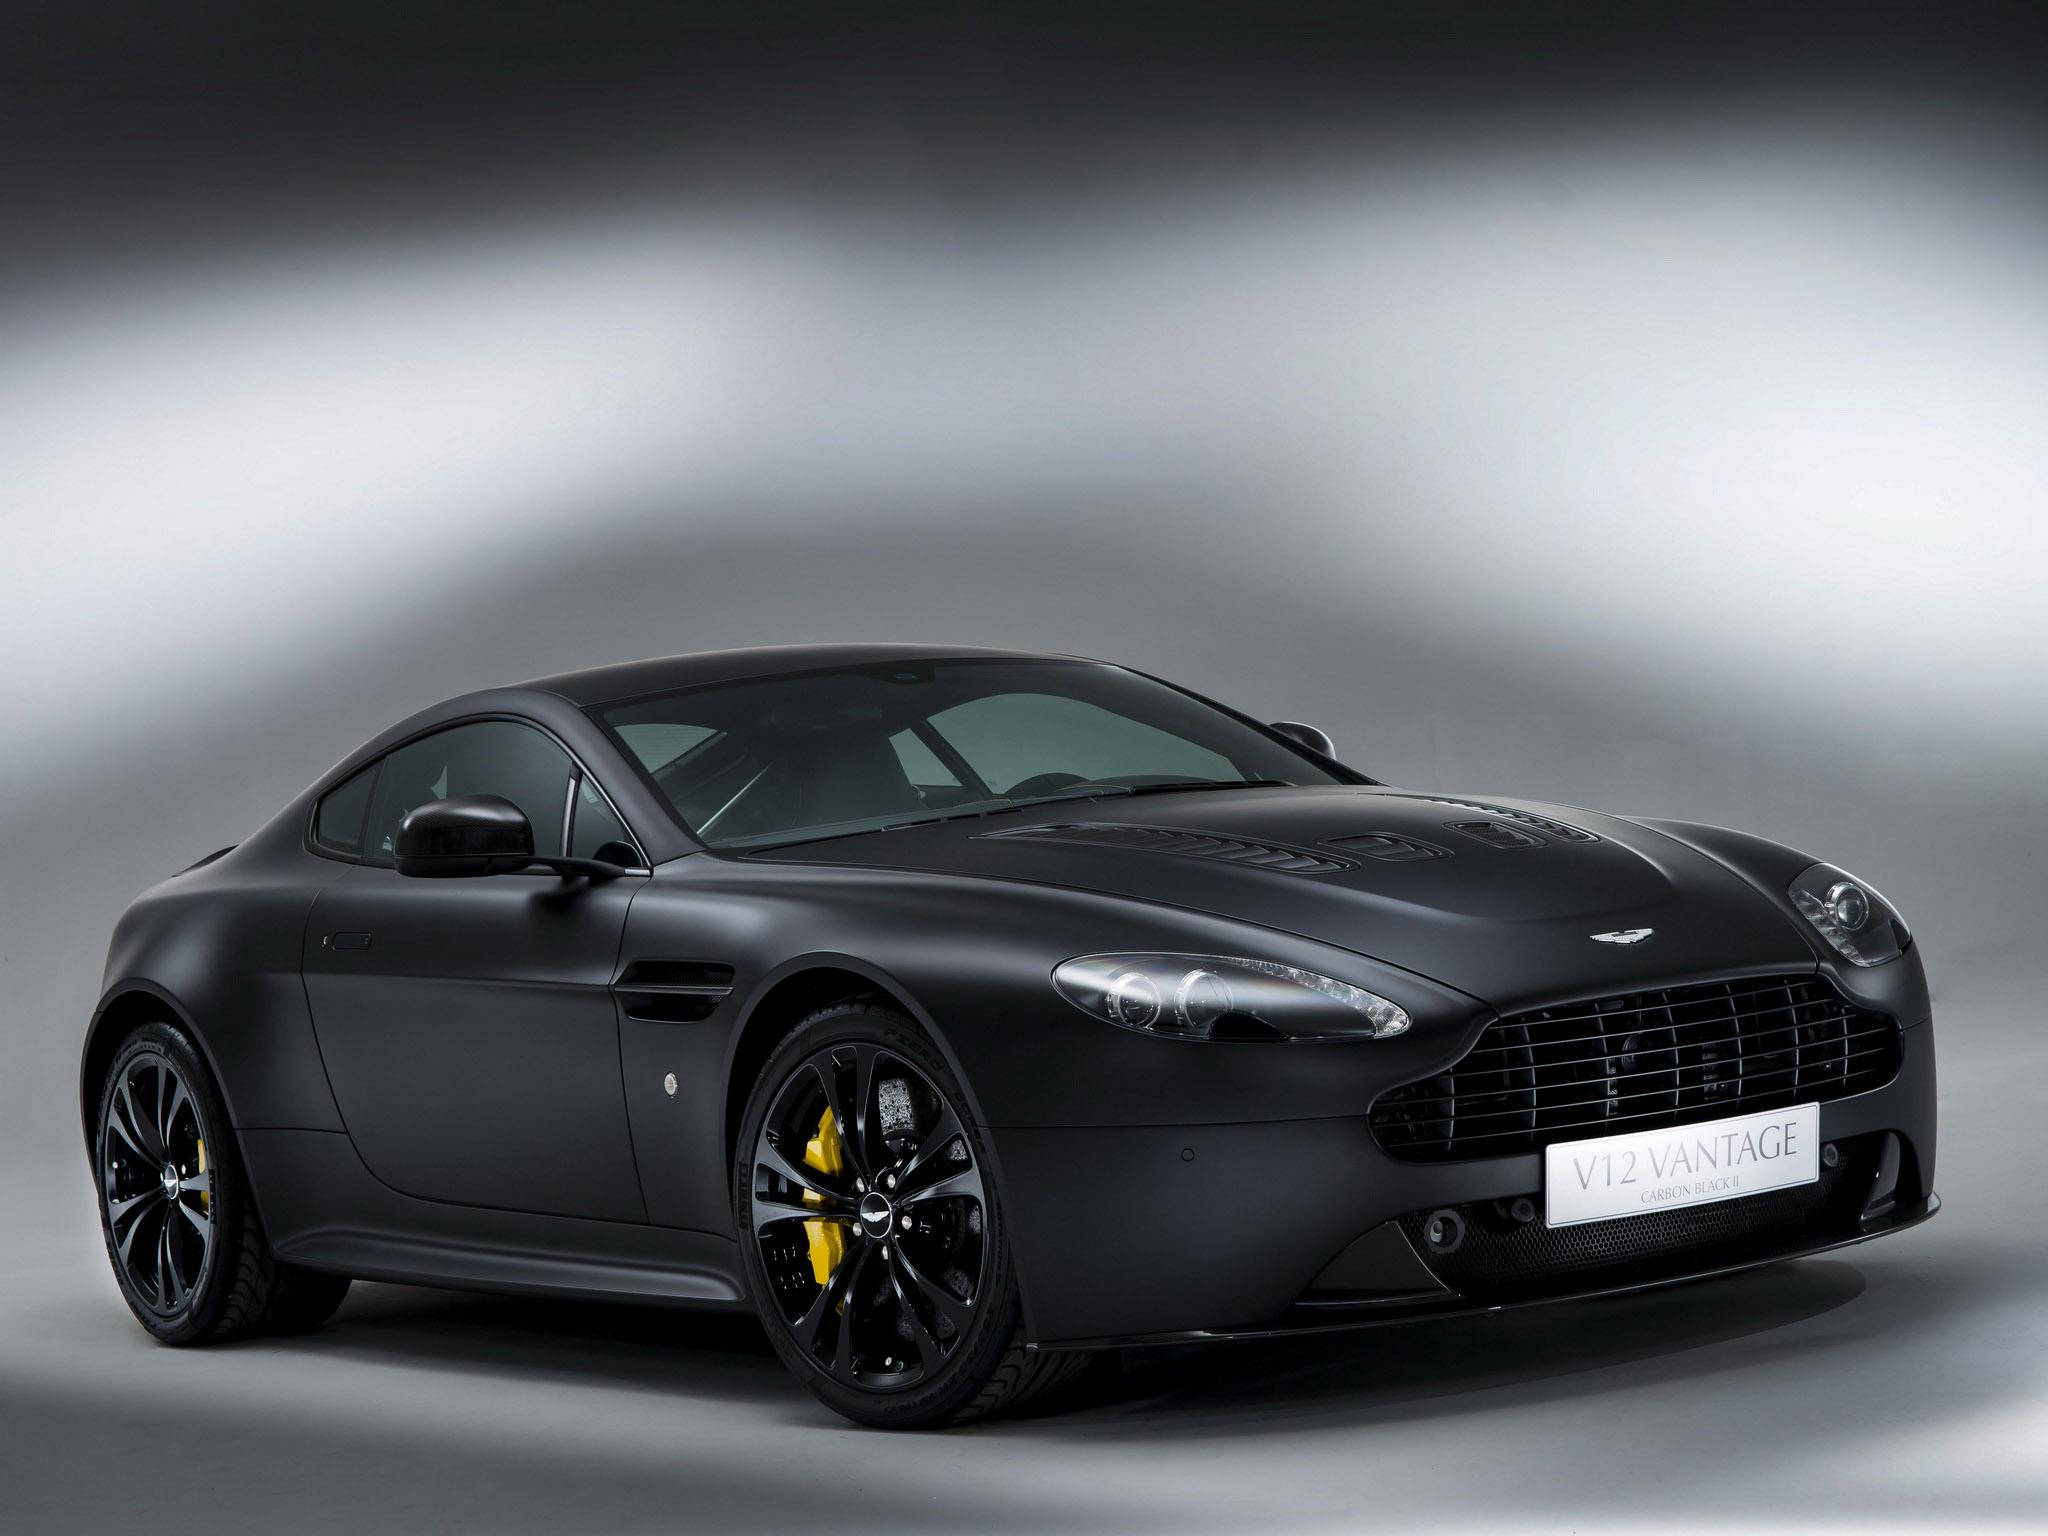 2013 aston martin v12 vantage carbon black sportcar wallpaper 2048x1536 104492 wallpaperup